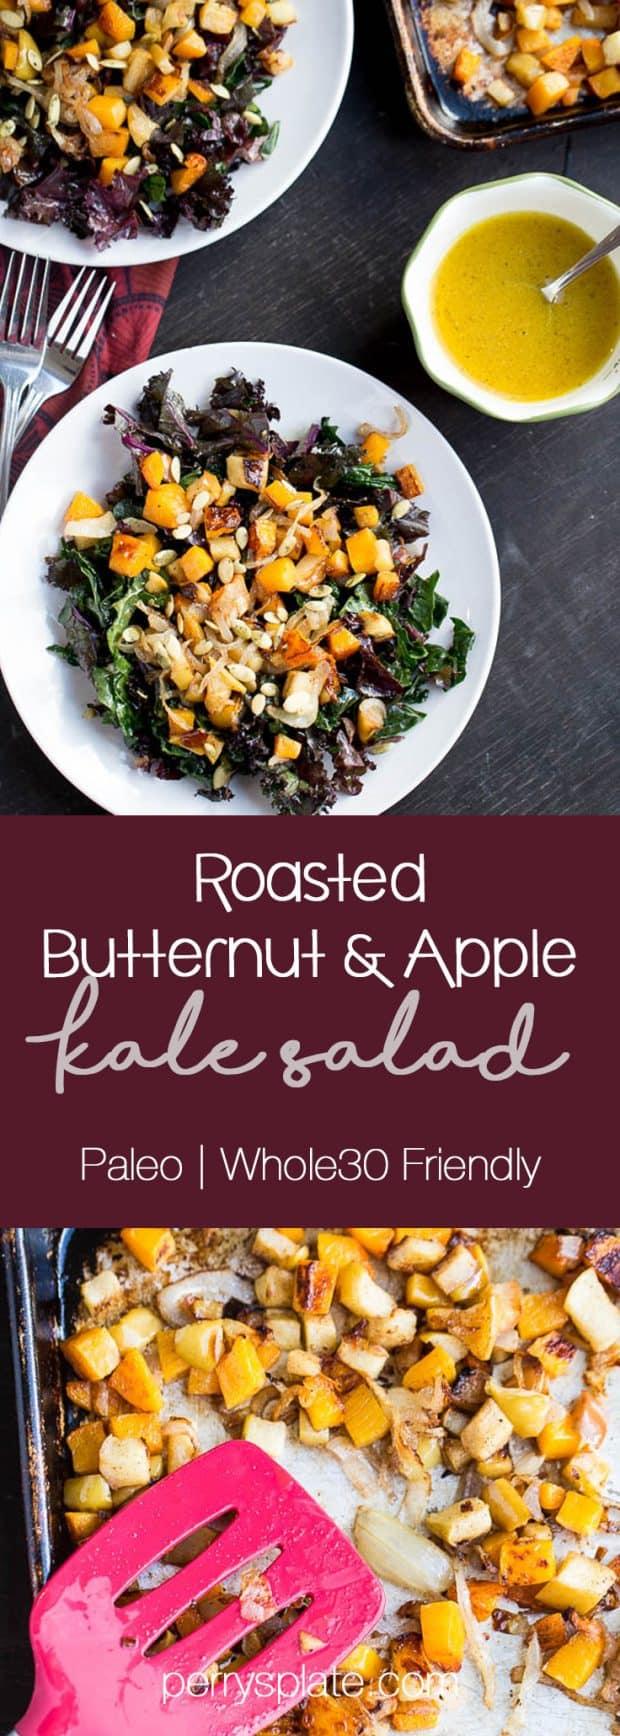 Kale Salad with Roasted Butternut Squash & Apples | paleo recipes | Whole30 recipes | kale recipes | perrysplate.com